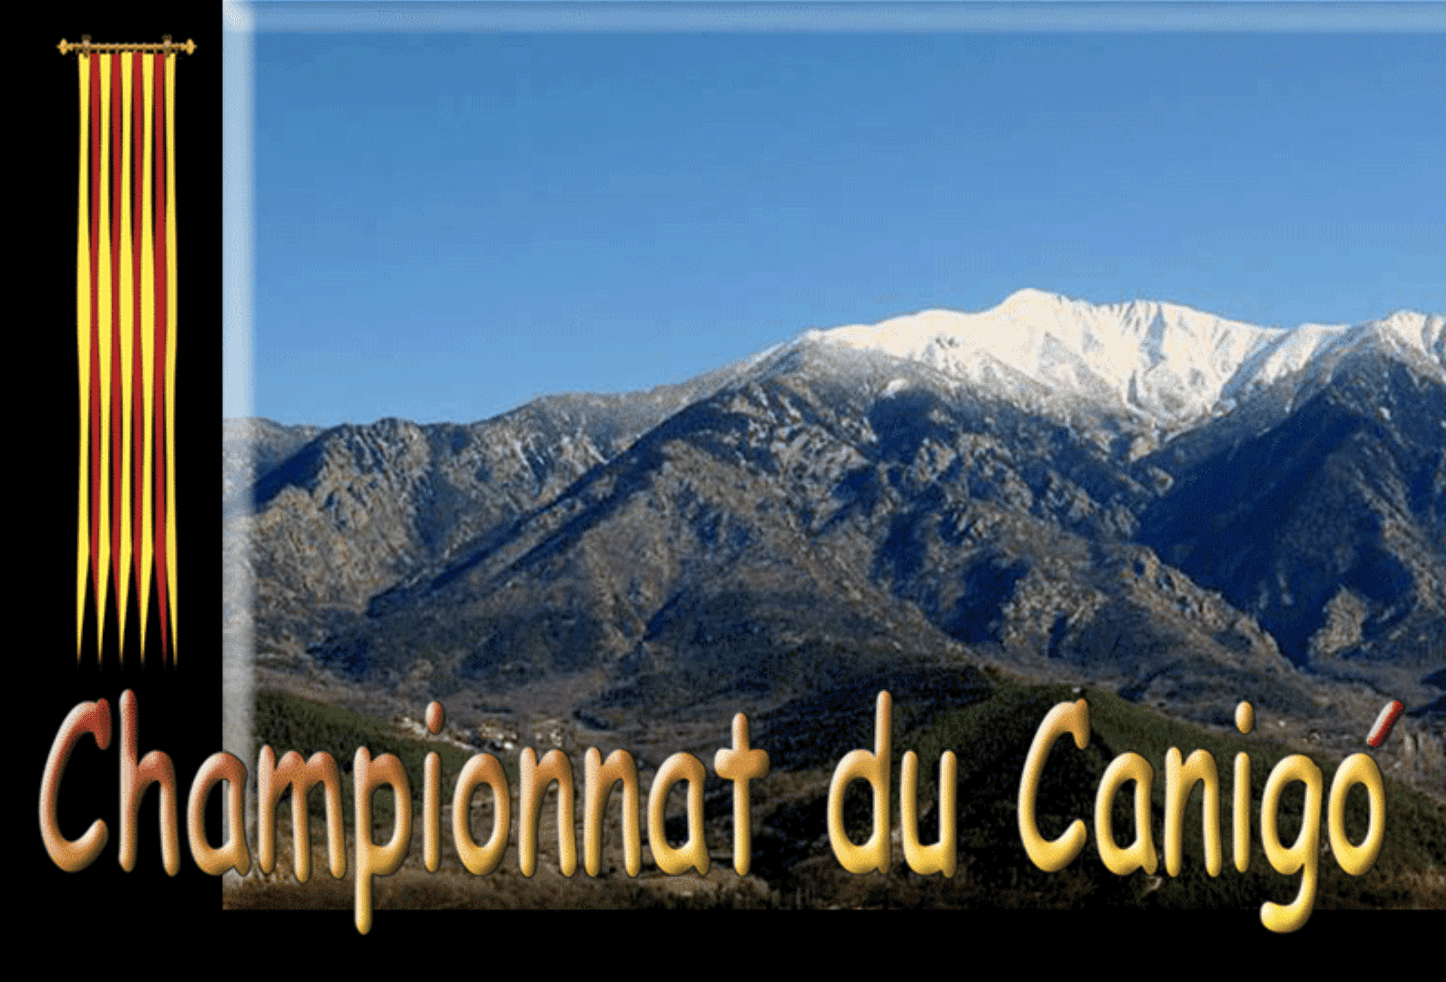 Affiche-Championnat-du-Canigo